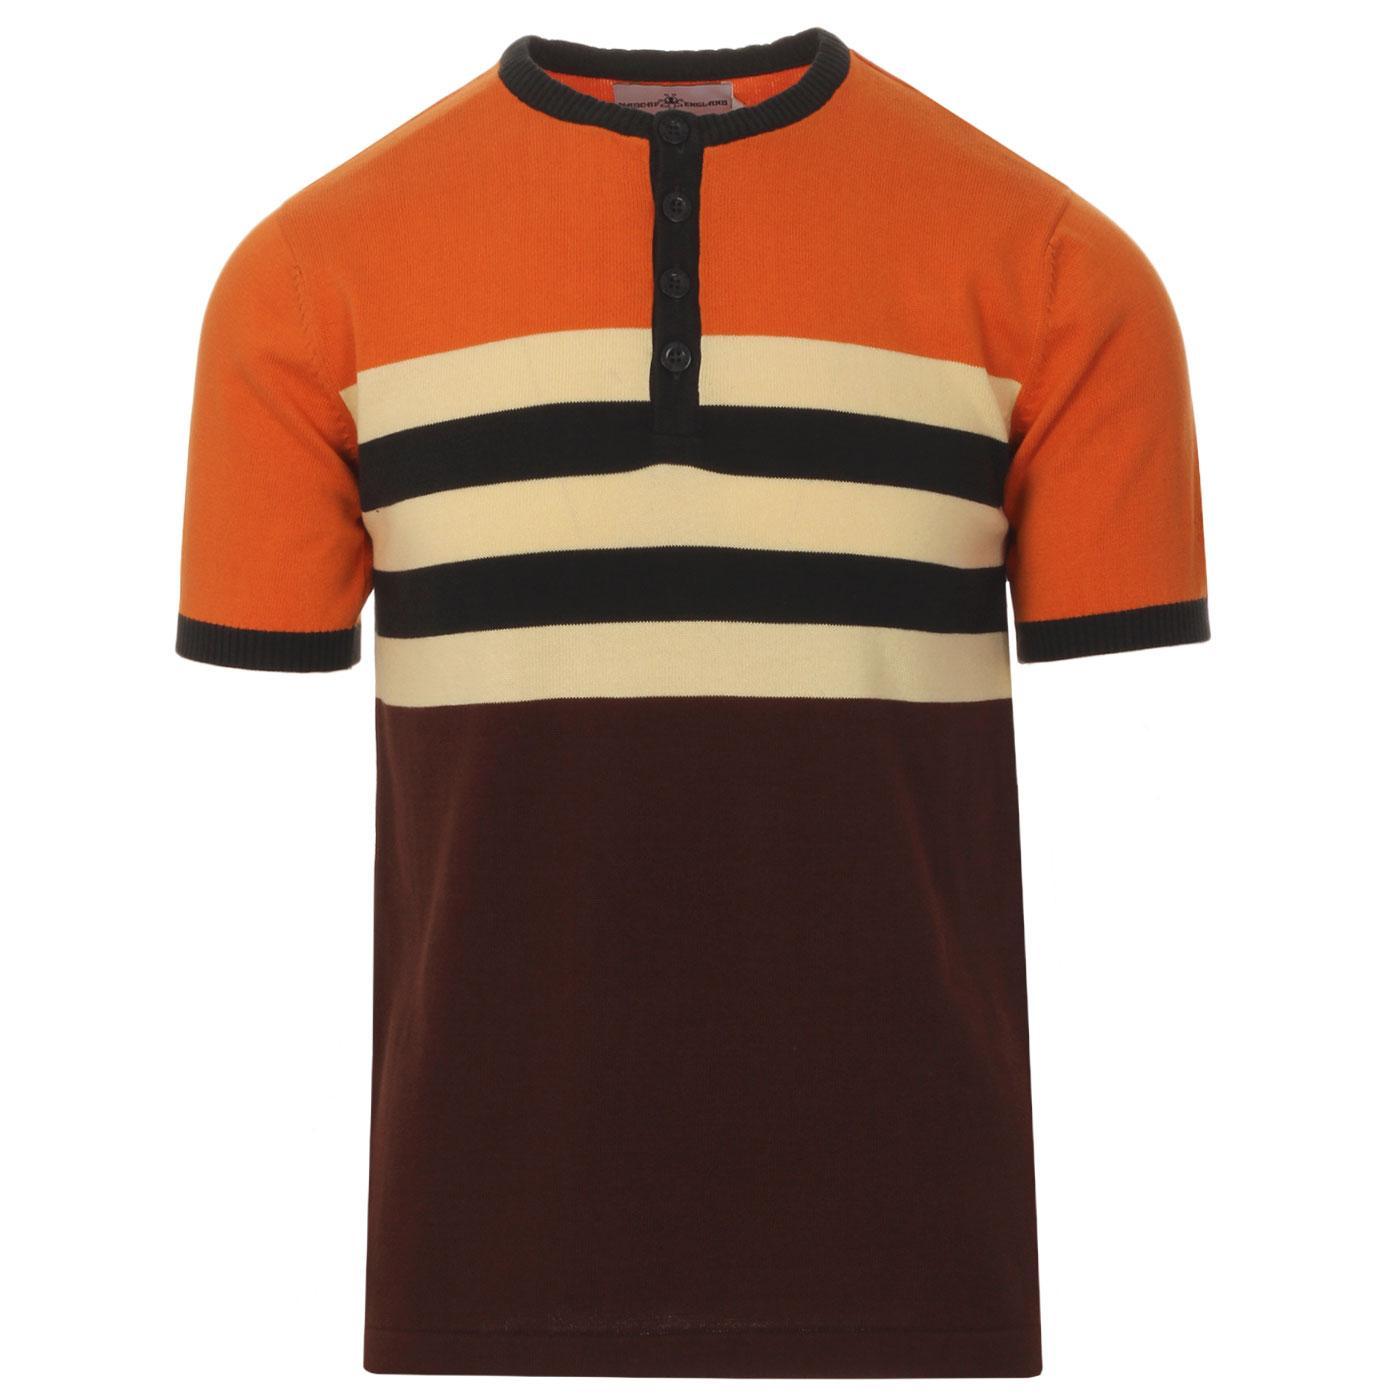 Hoople MADCAP ENGLAND Stripe Knit Grandad Top